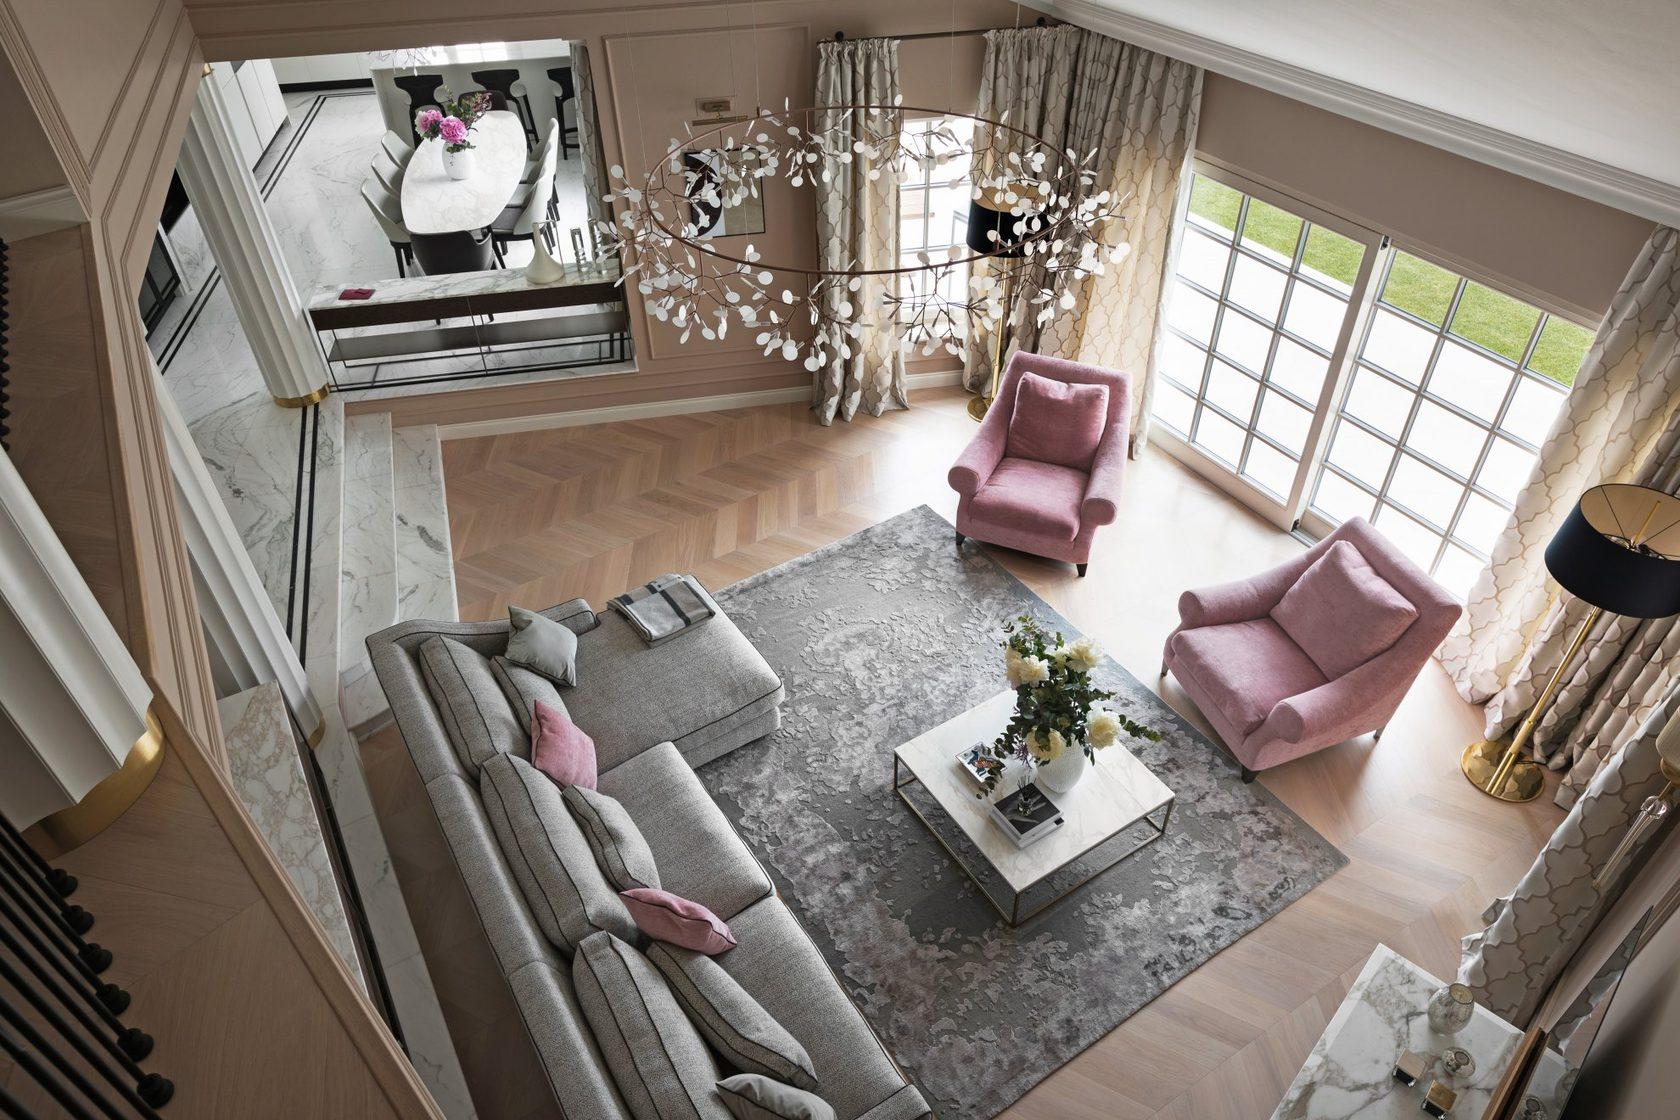 Проект: Private Residence at Roquebrune-Cap-Martin<br />Компанія: Bolshakova Interiors